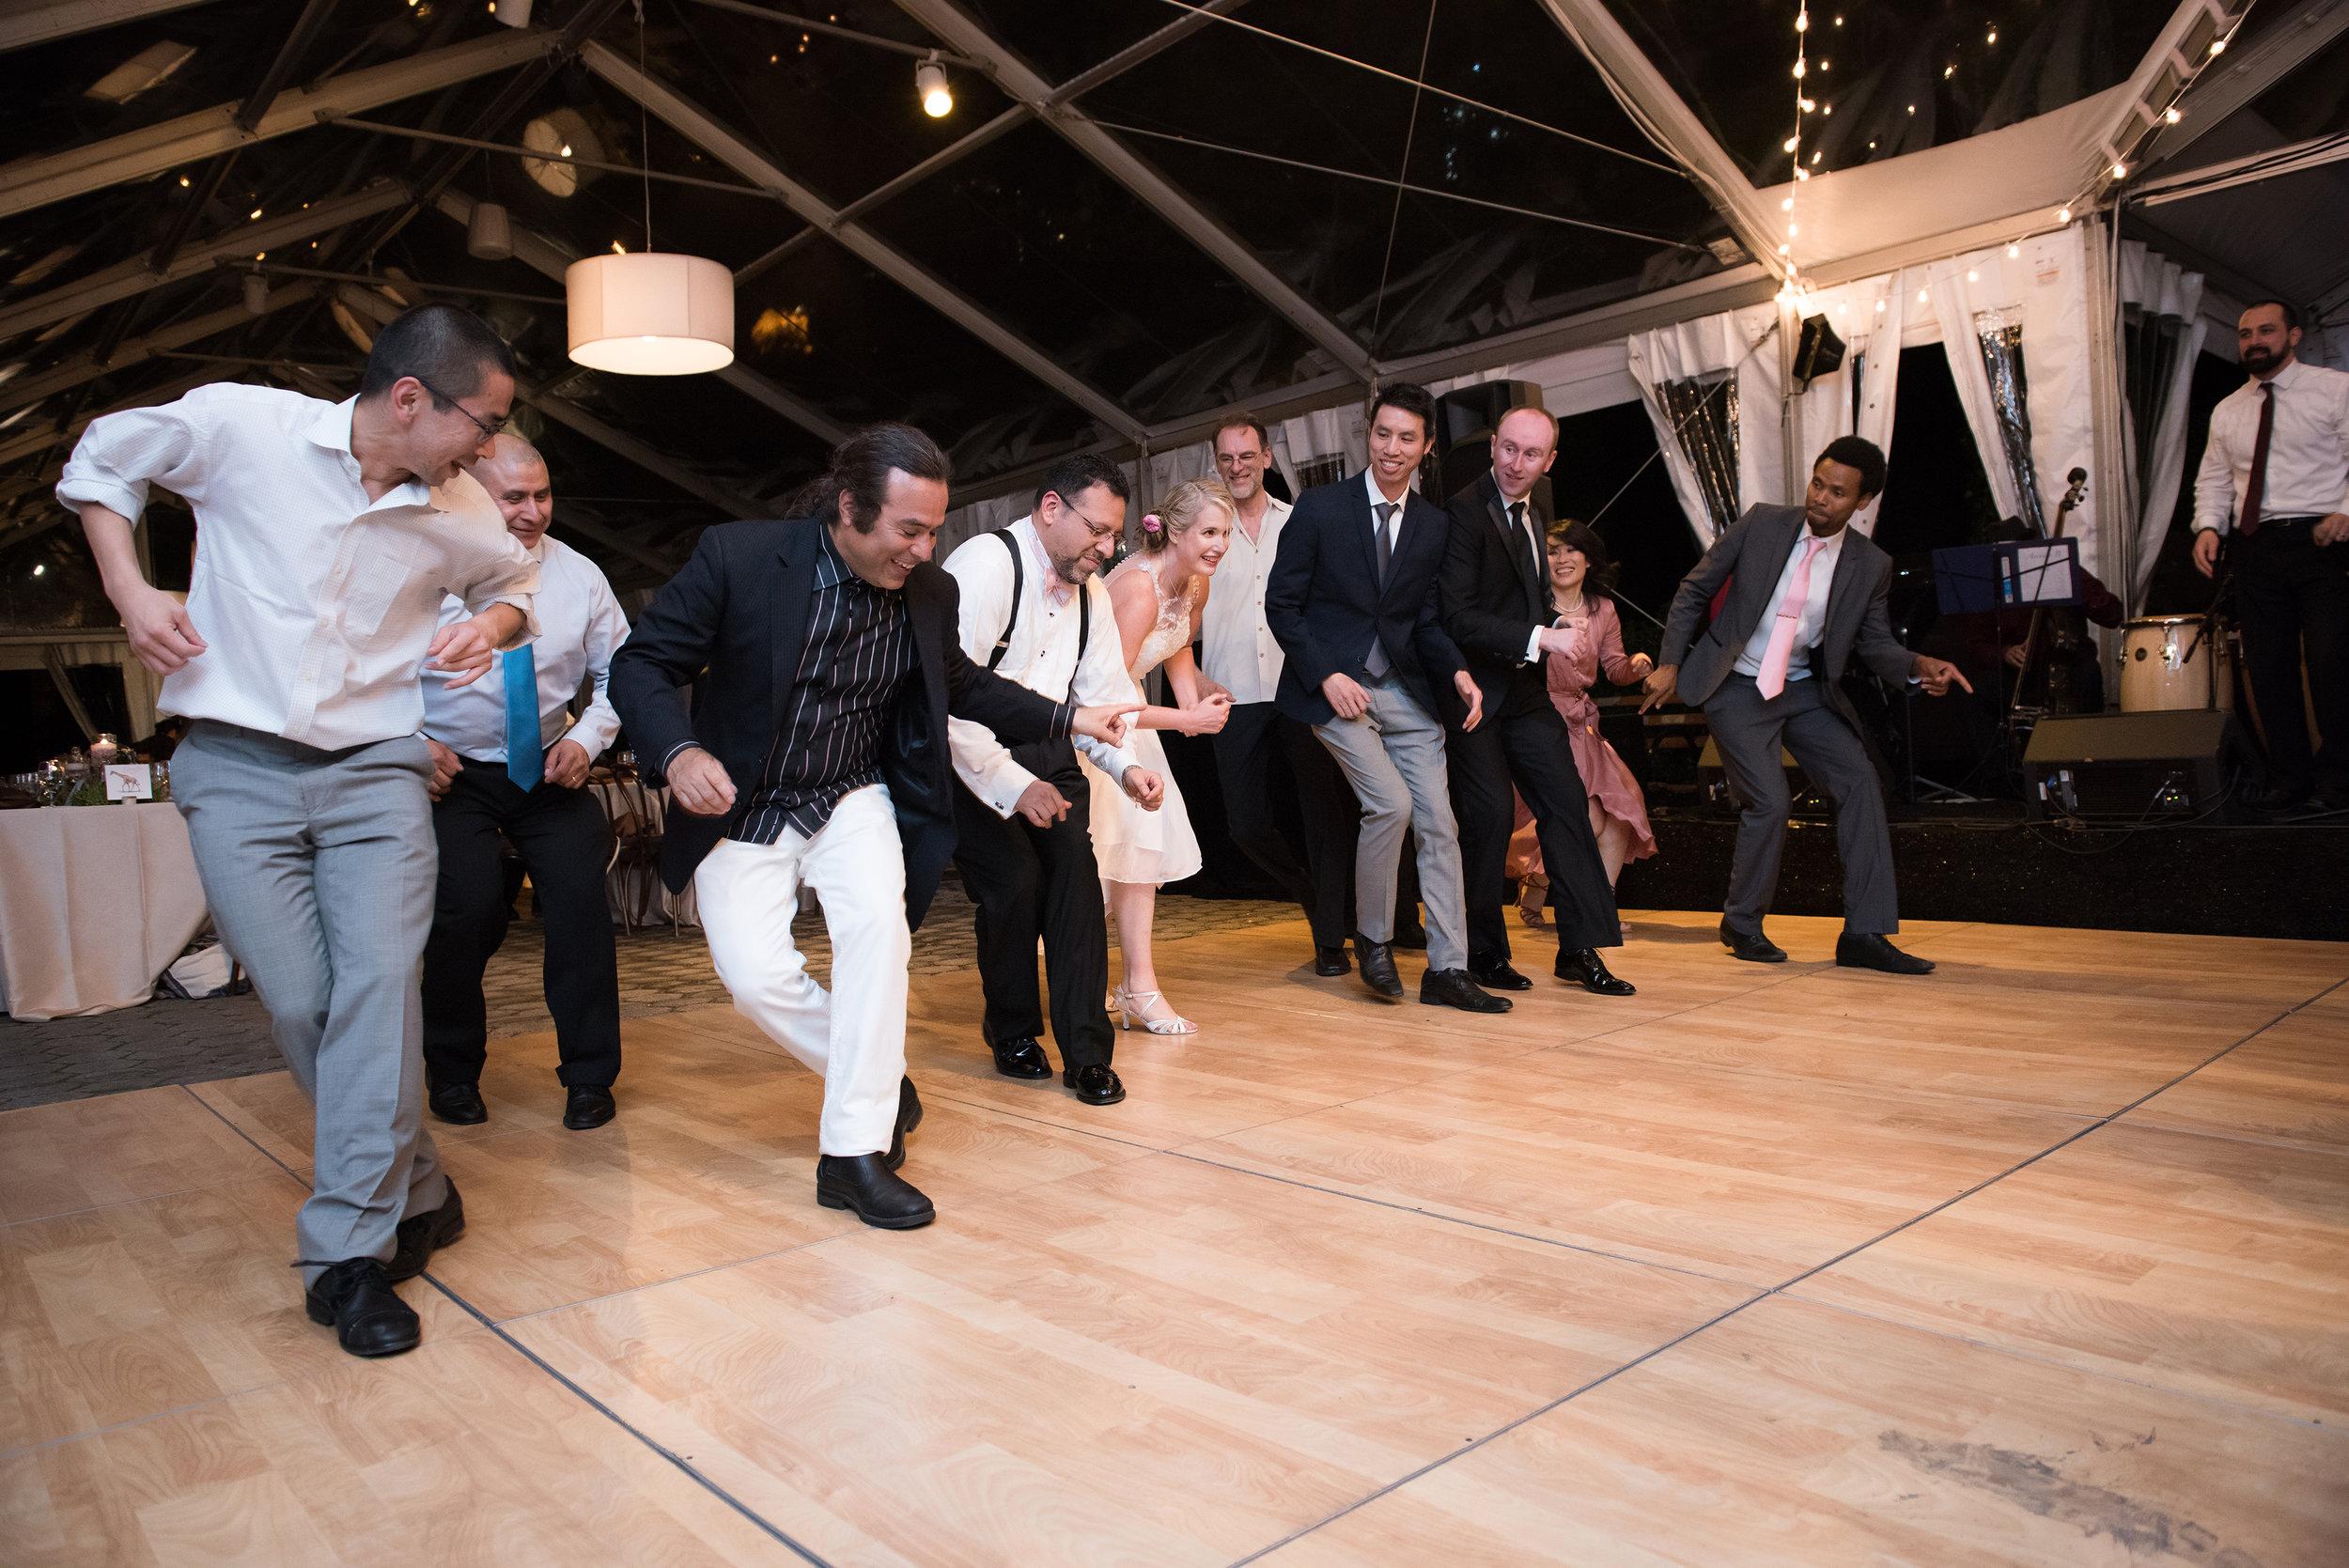 victorious-events-nyc-039-colleen-taka-central-park-zoo-wedding-raymond-hamlin.jpg